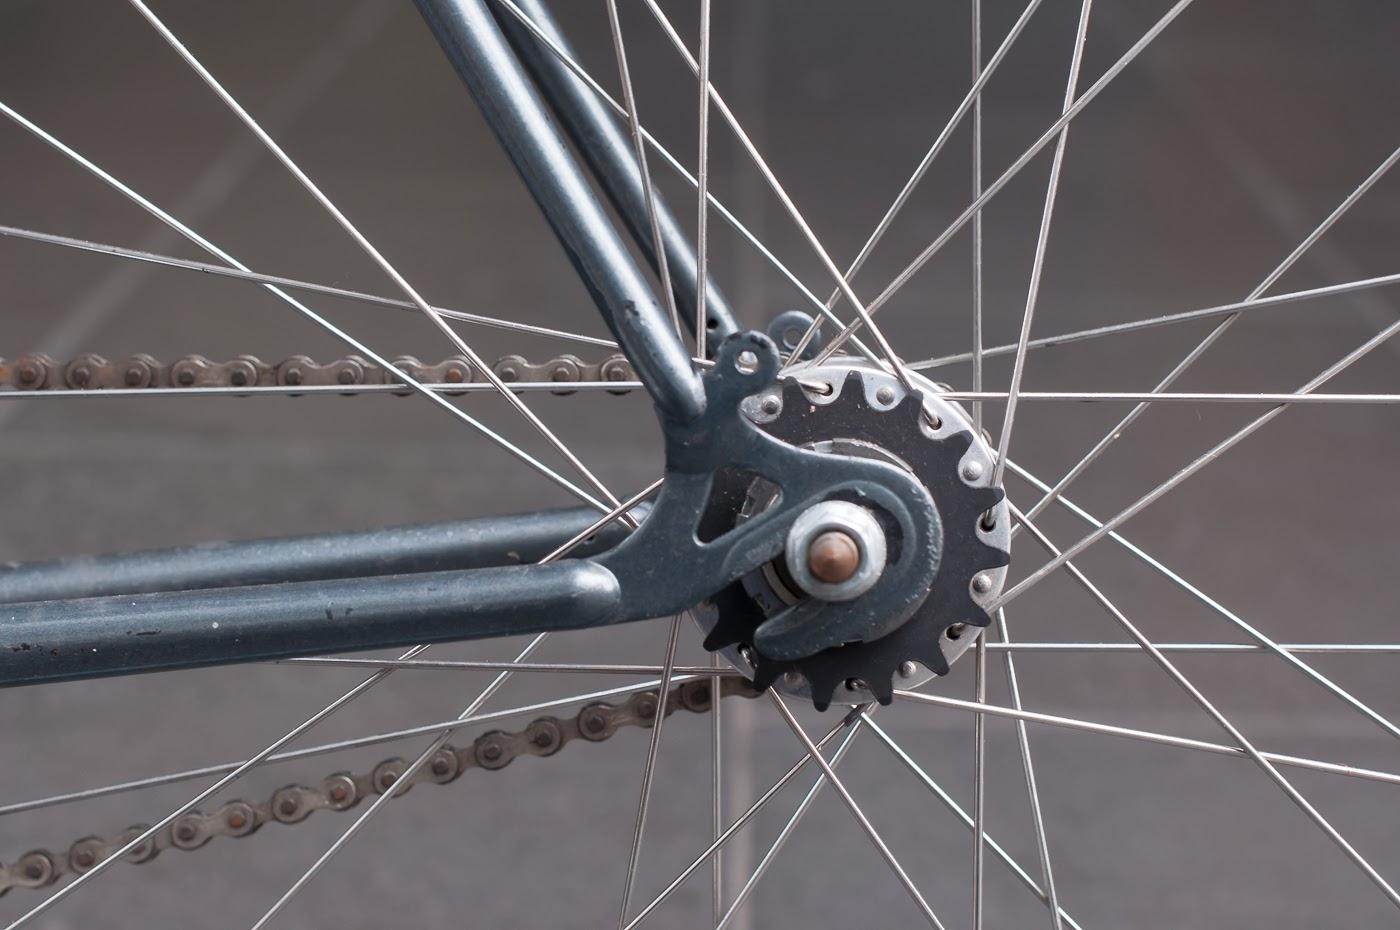 single speed, bike, bicycle, tim macauley, the biketorialist, melbourne, conversion, chain, road bike,  bourke st, custom, frame